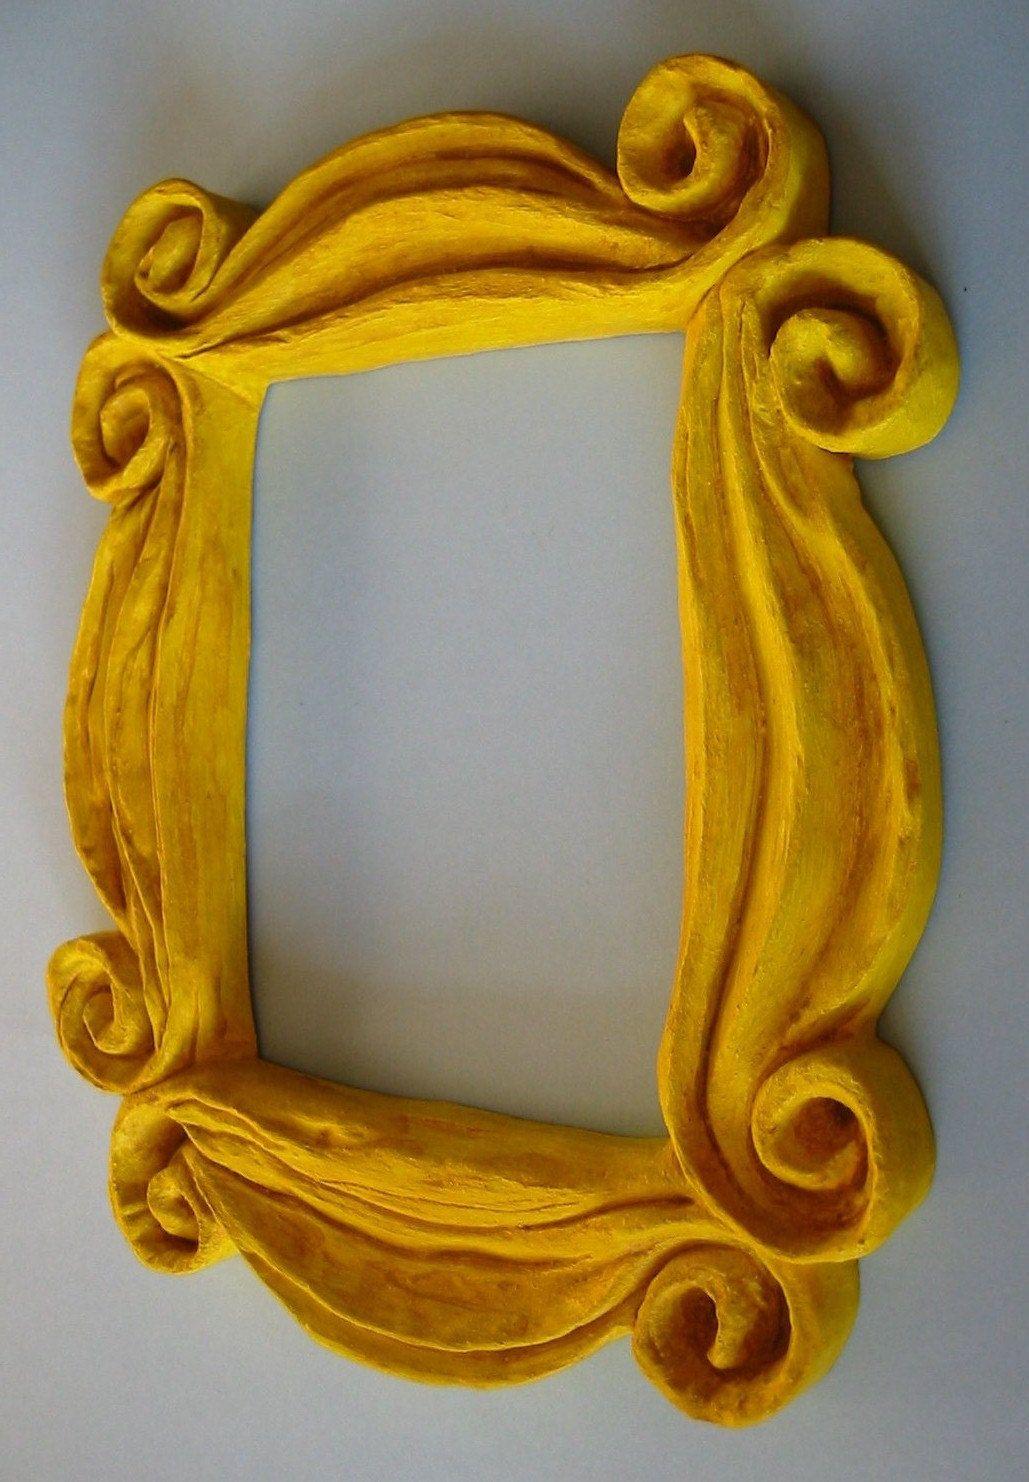 FRIENDS - Monica\'s Apartment Peephole Frame Prop Replica | Flats ...